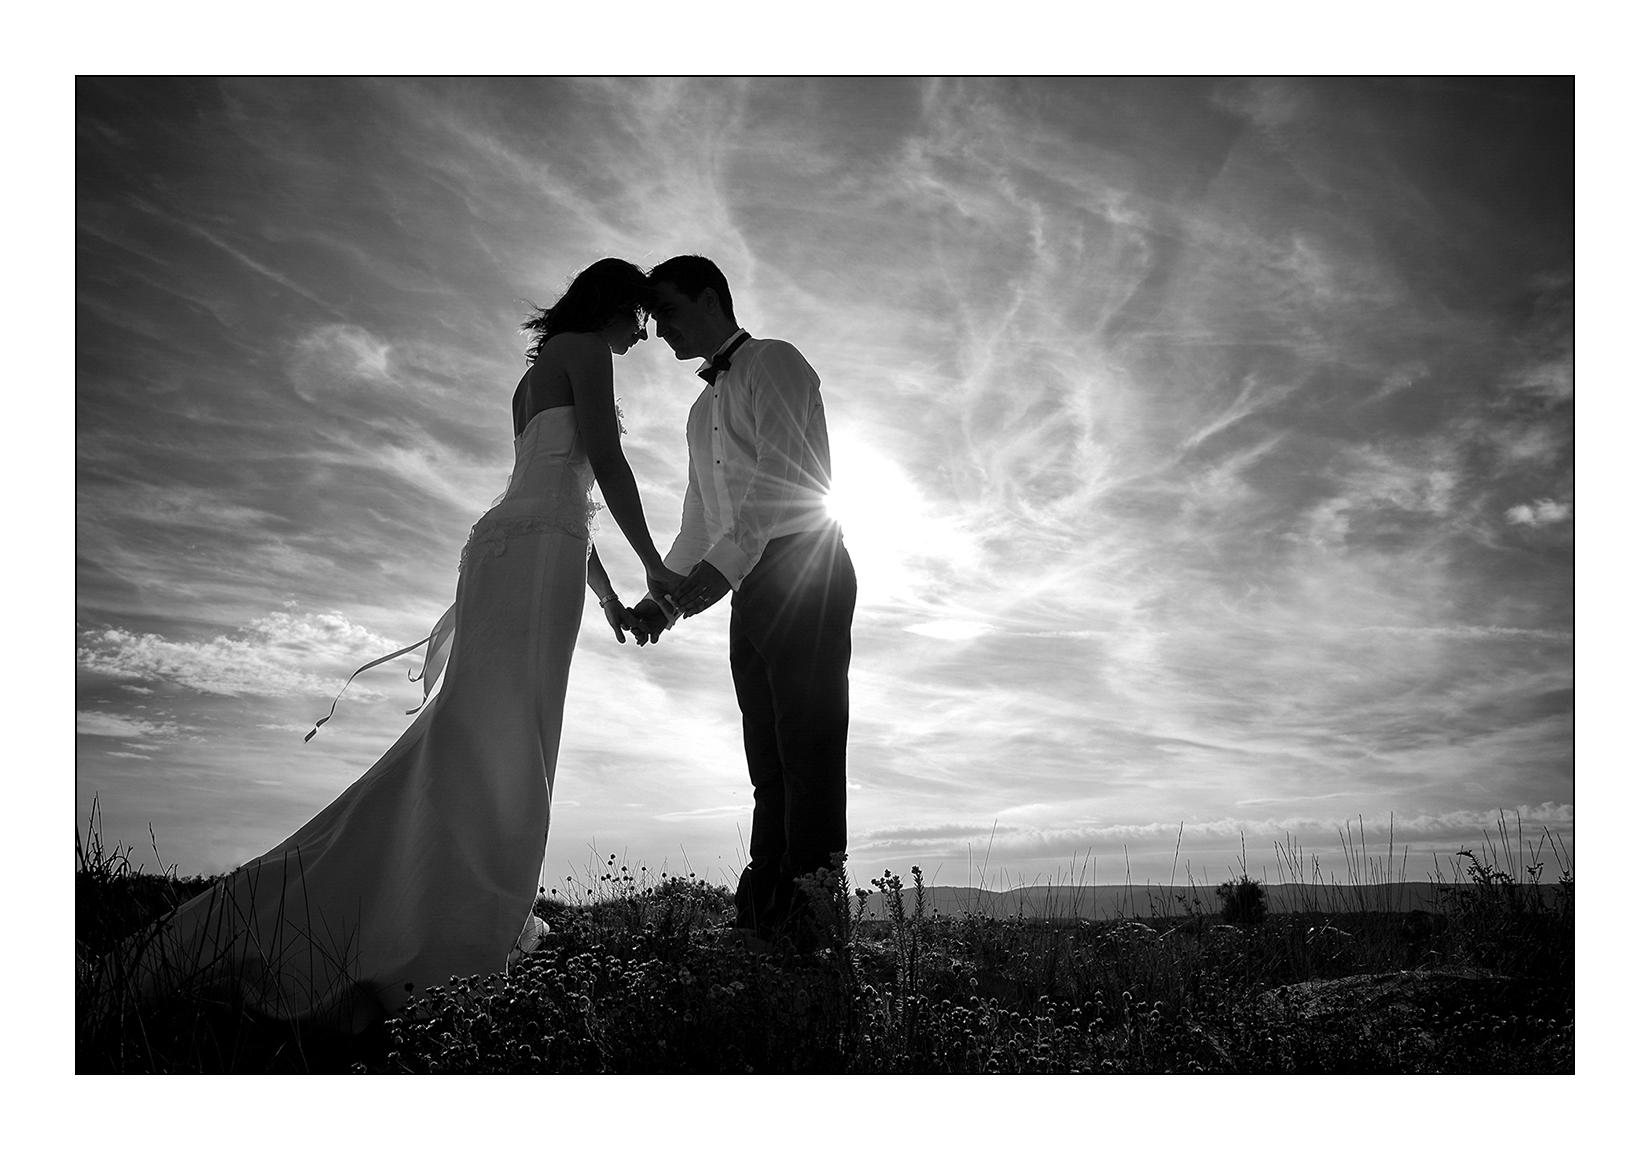 mariage-noir-blanc-reportage-emotion-couple